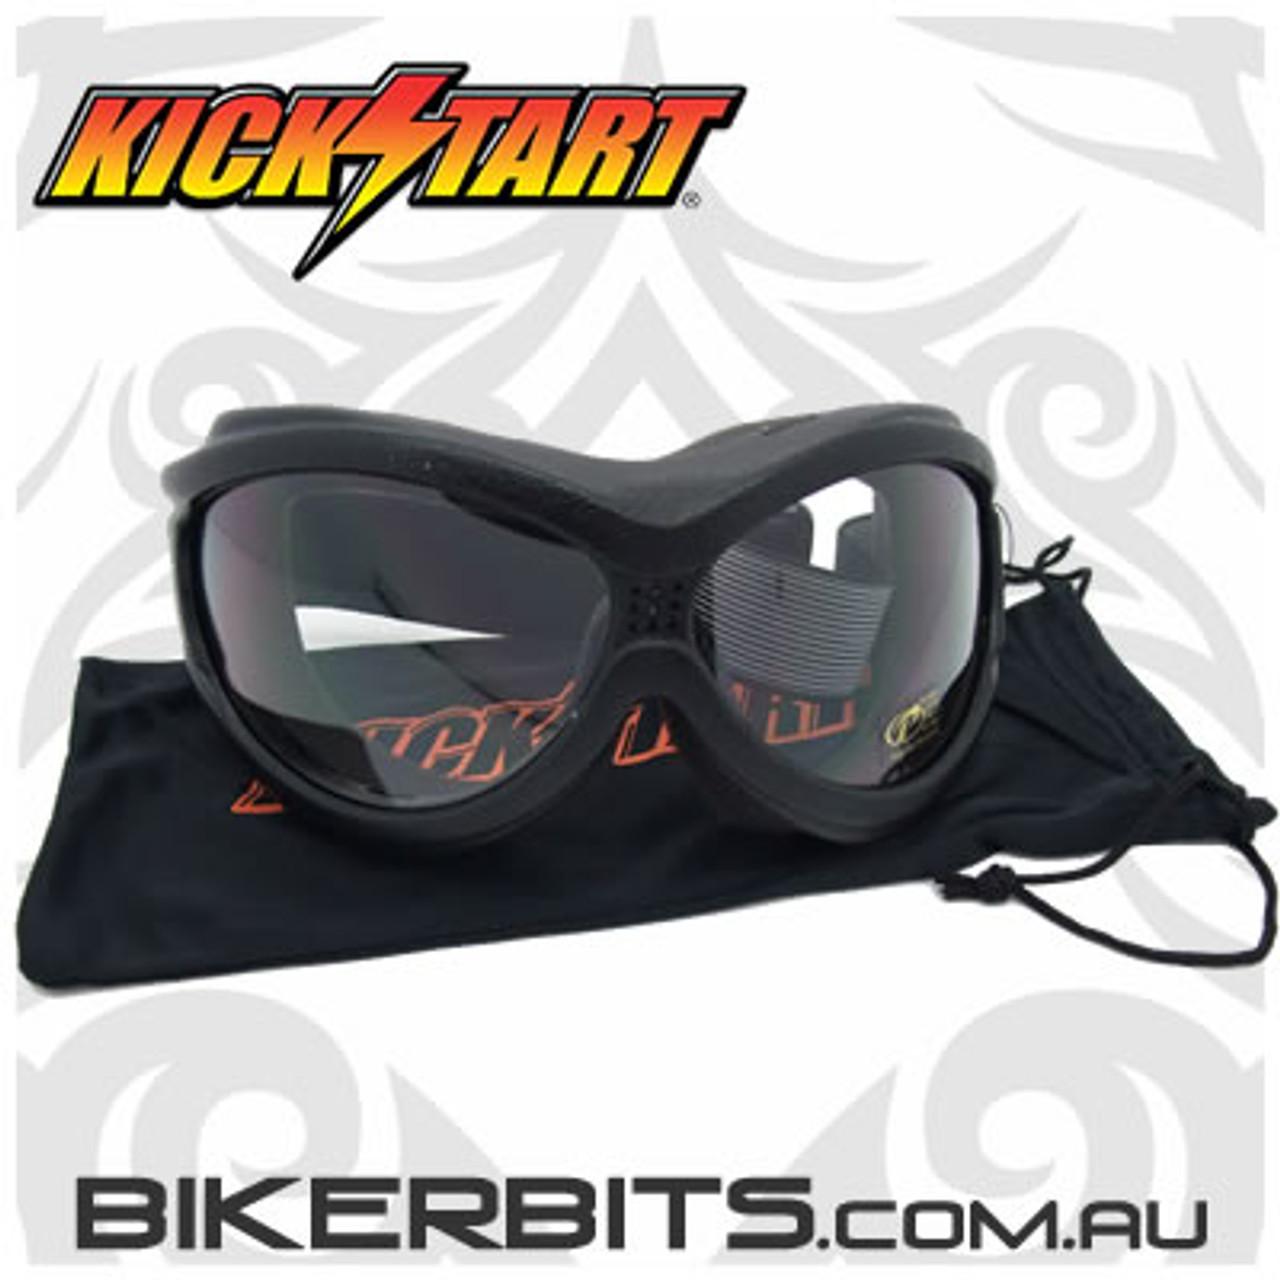 Motorcycle Goggles - Kickstart Beast- Clear/Black